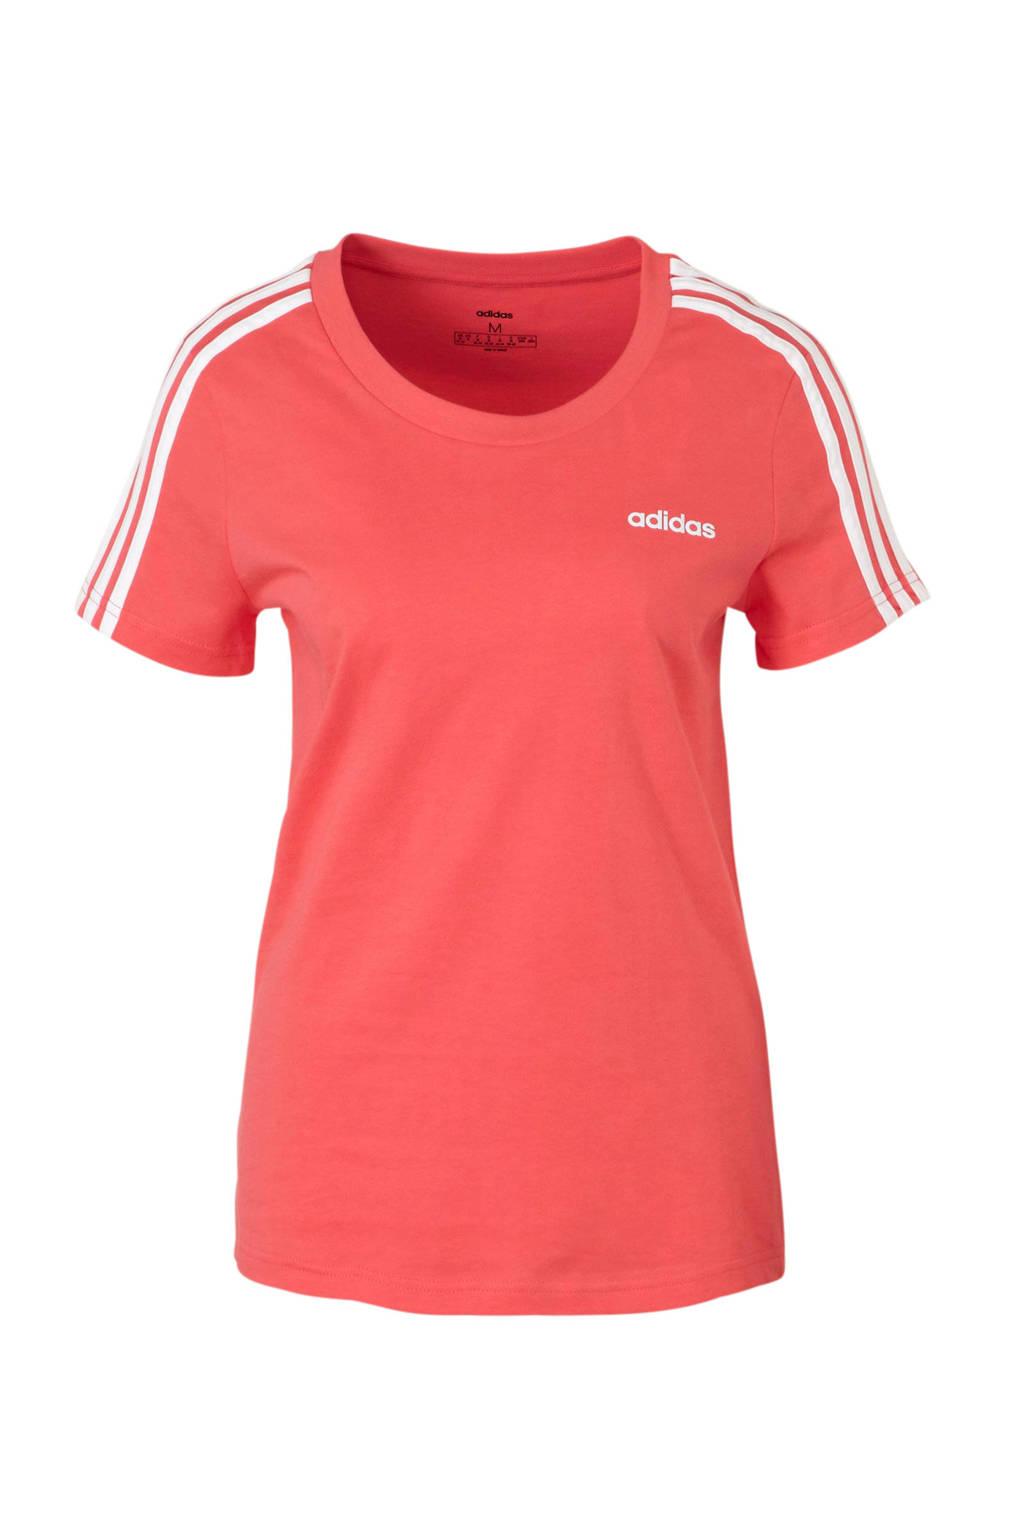 adidas performance sport T-shirt roze, Roze/wit